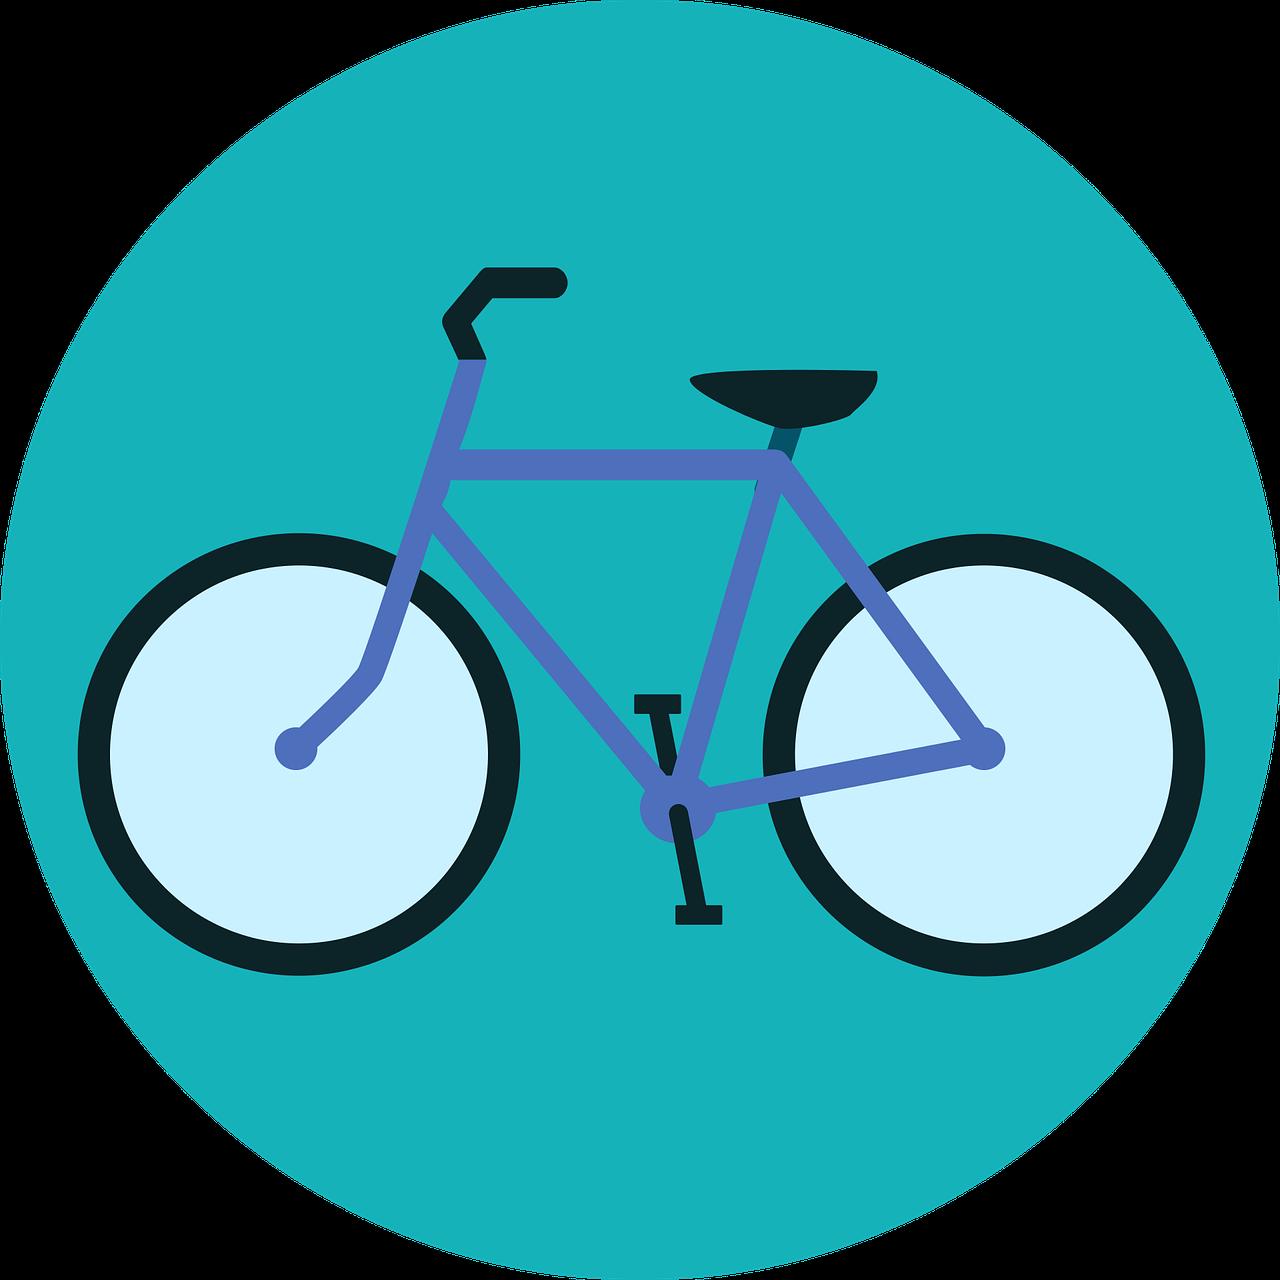 Bike Wheel Cycling Sport  - Ricinator / Pixabay